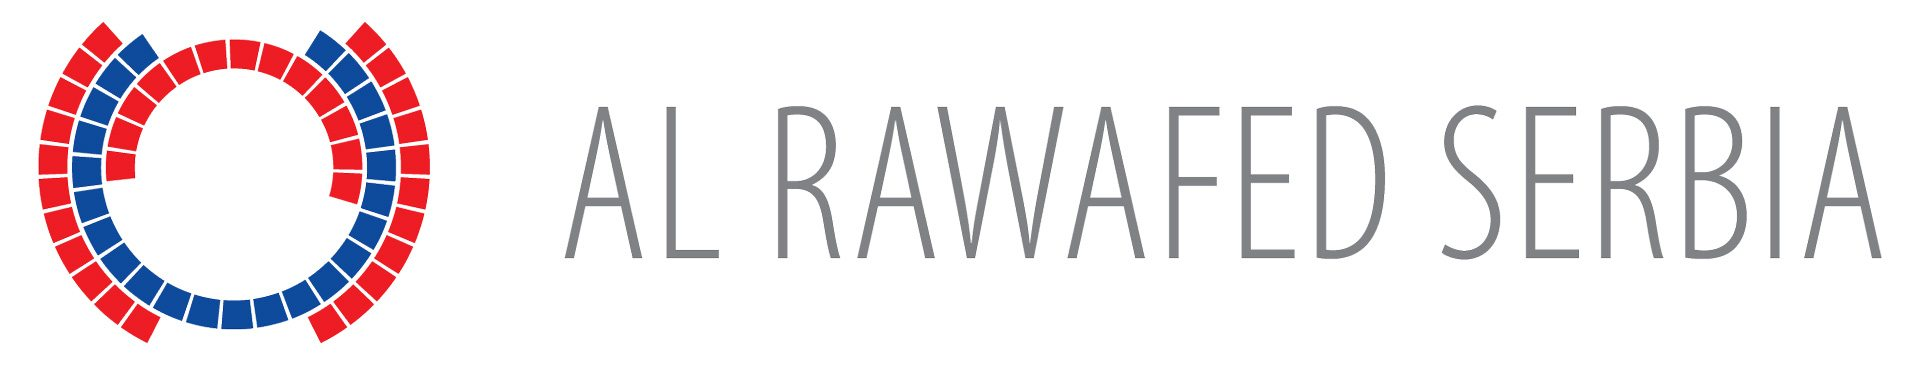 Al-Rawafed-Serbia